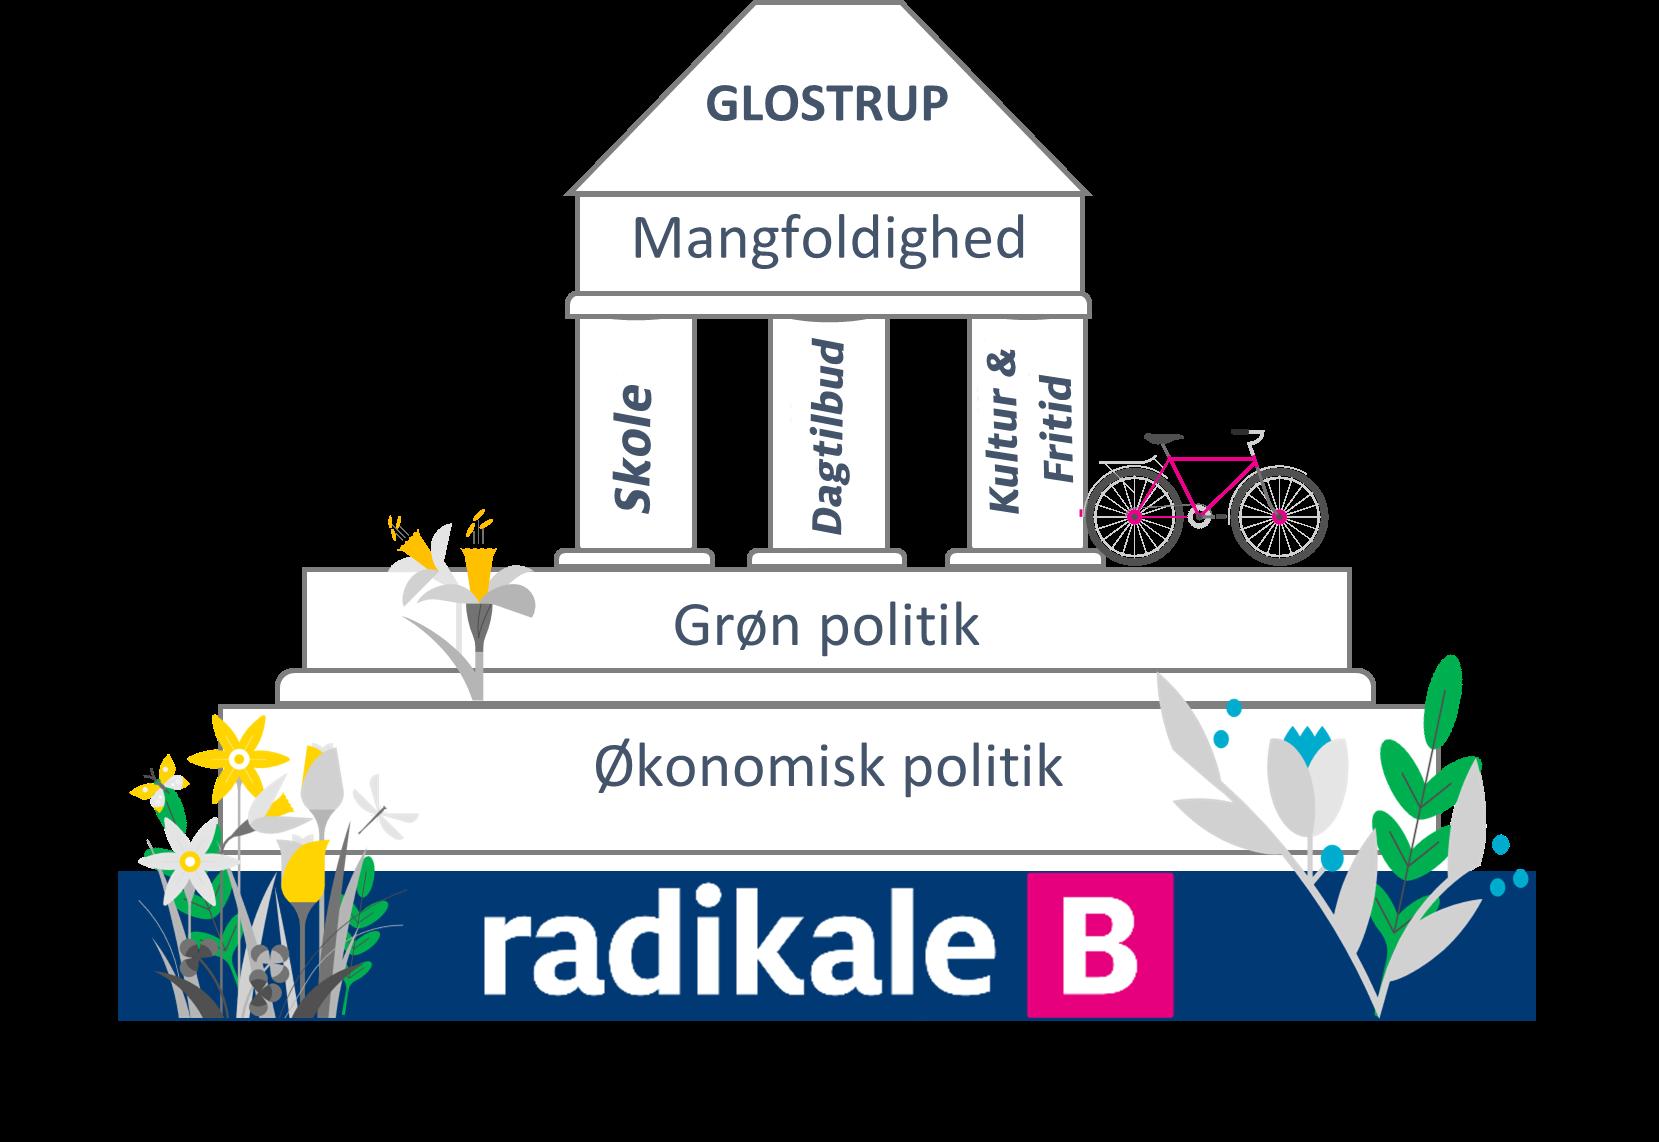 https://usercontent.one/wp/glostrupradikale.dk/wp-content/uploads/2021/05/GRV-Hus-v2.png